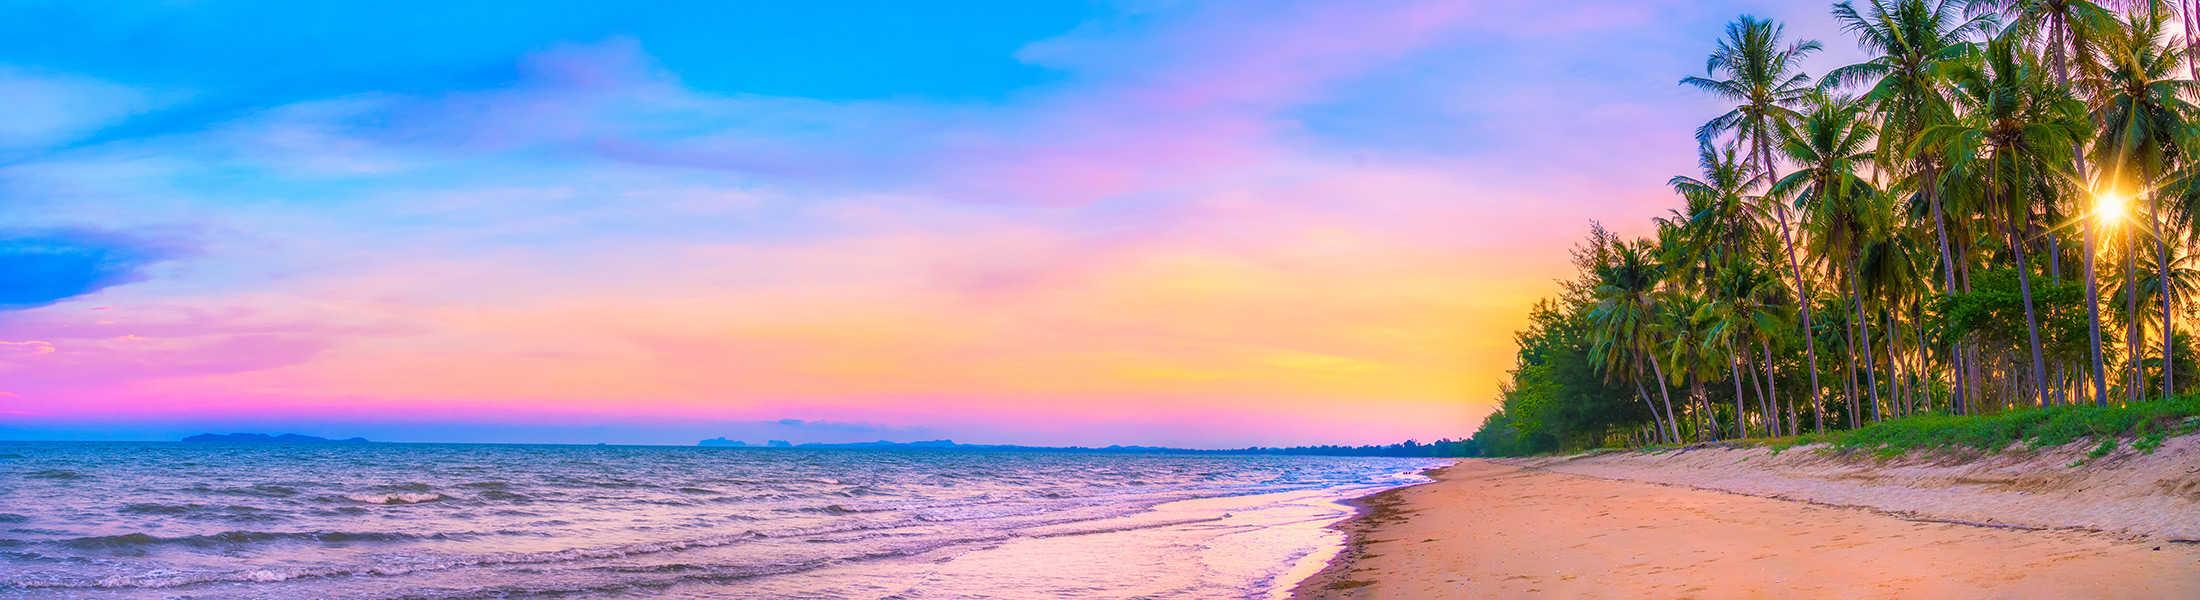 Phuket Beach at Sunset on a Thailand Multi-Centre